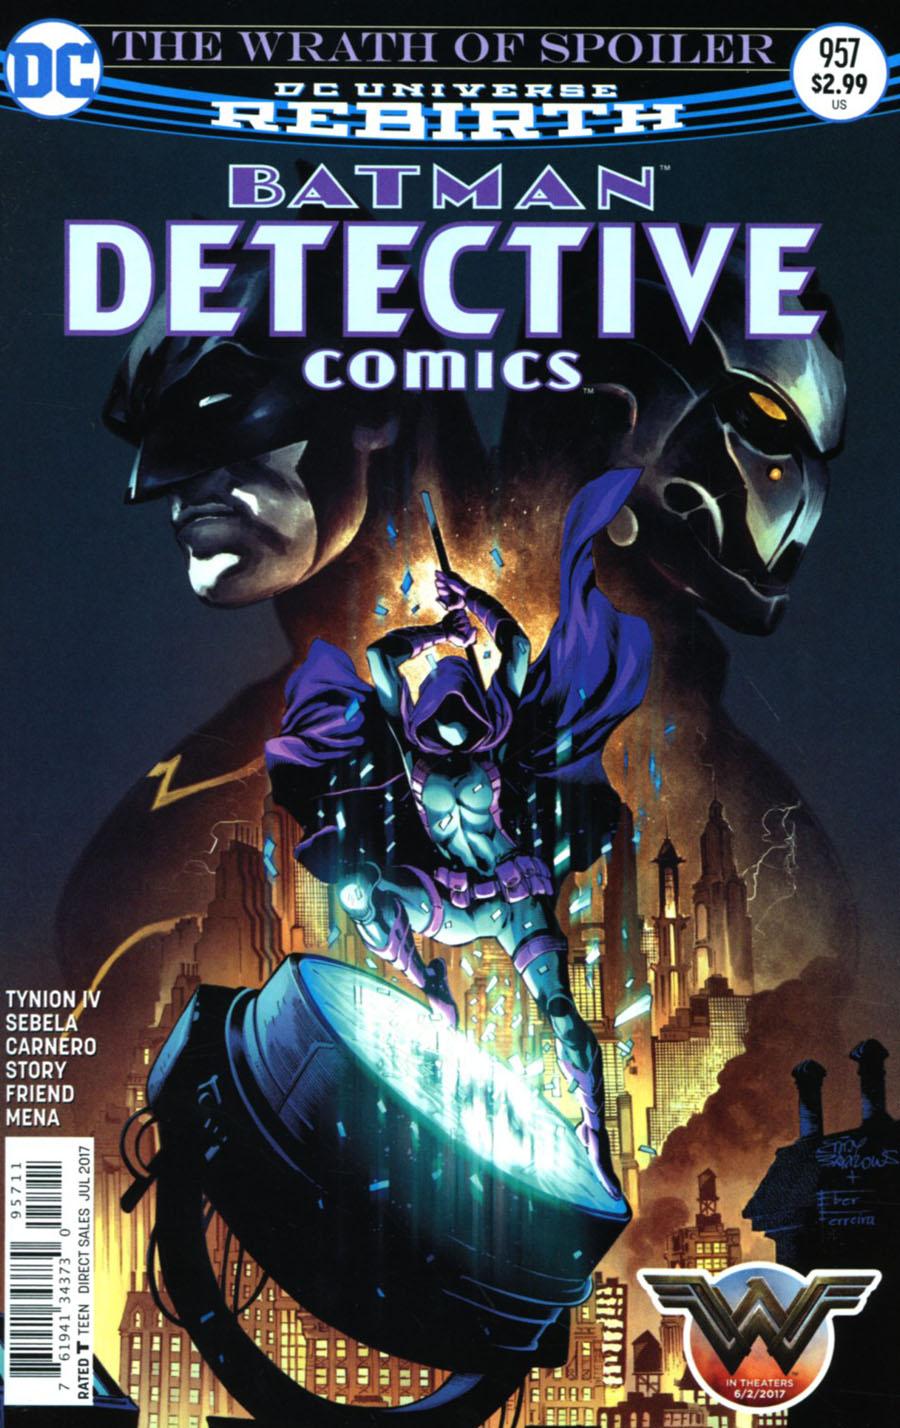 Batman - Detective Comics 957 - The Wrath Of Spoiler